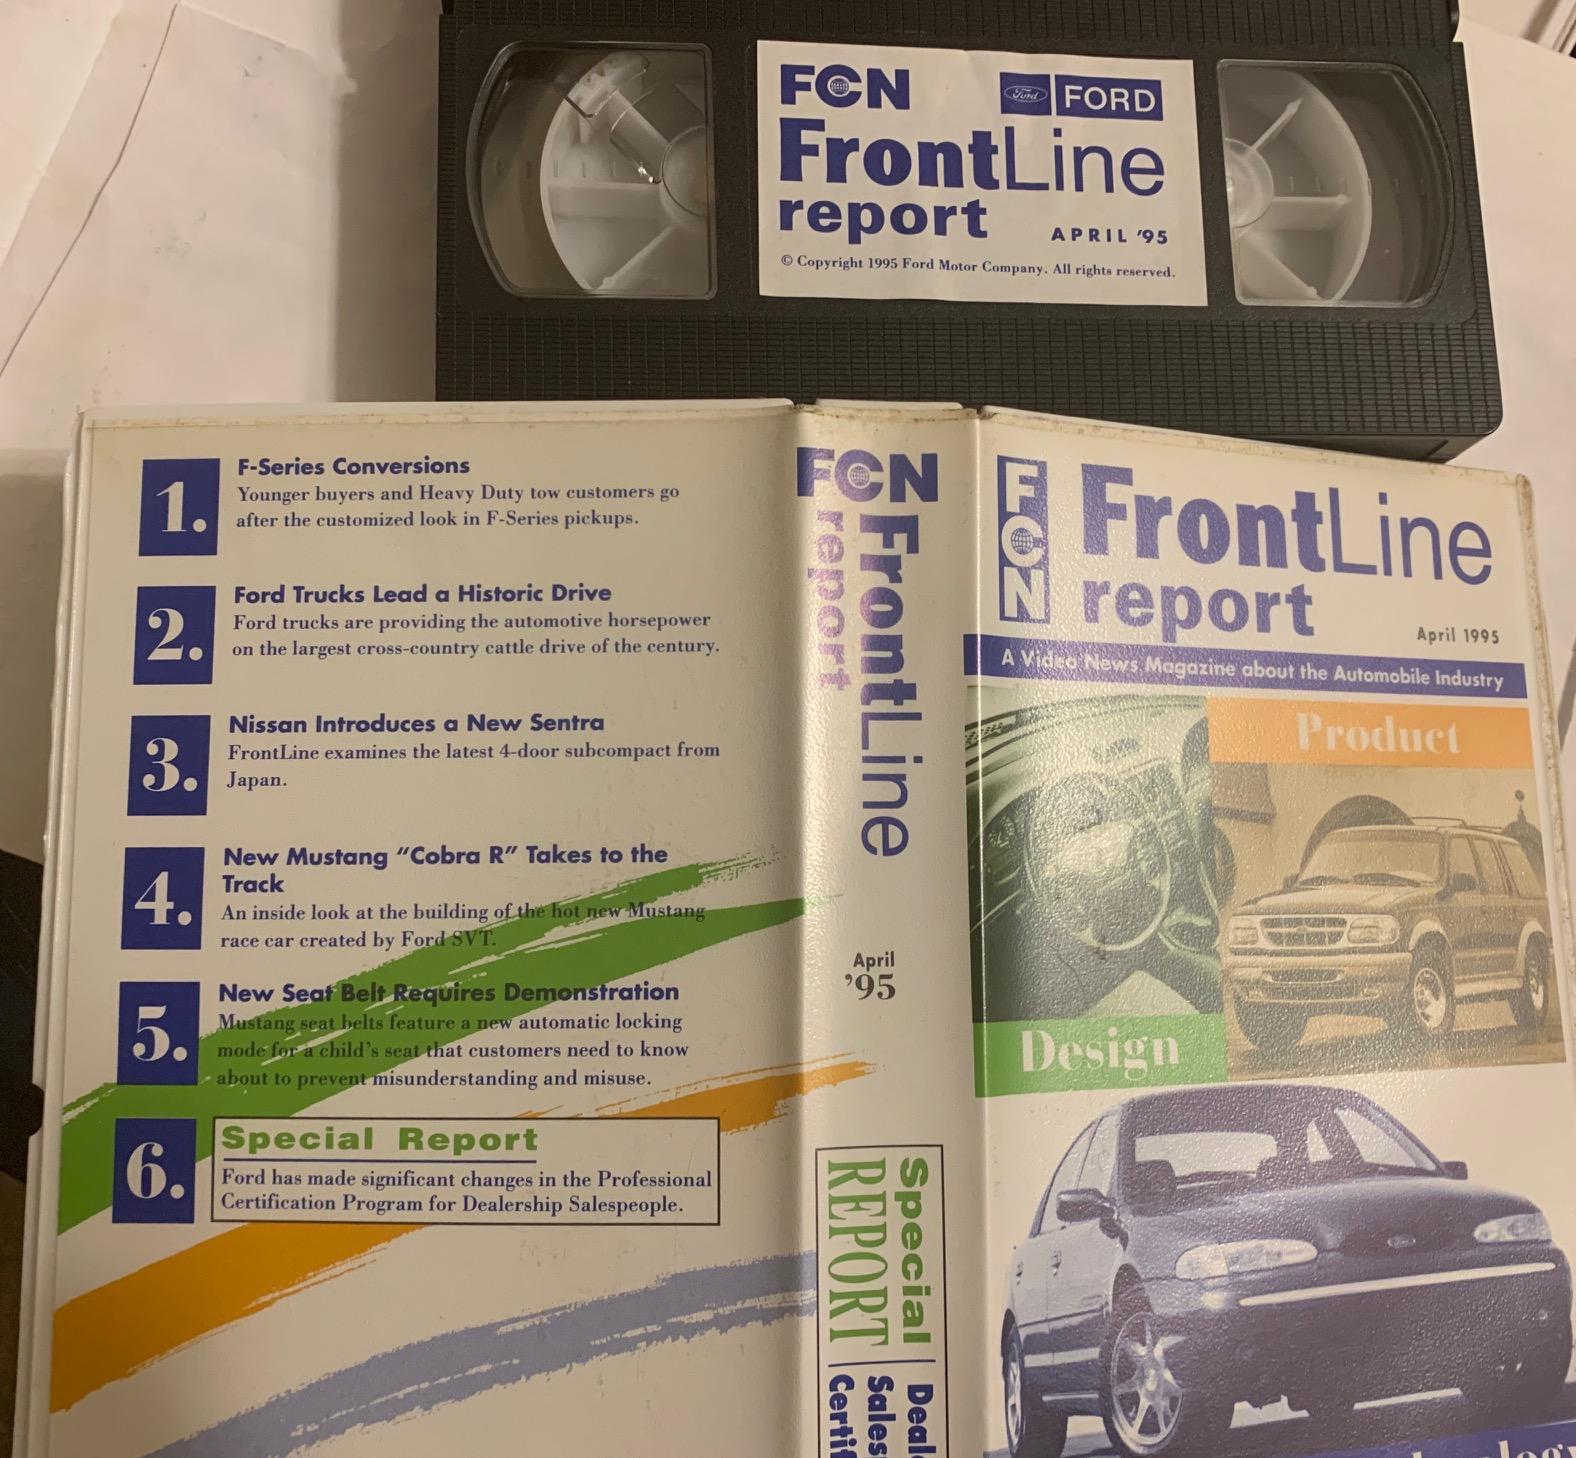 95rfrontline.jpg